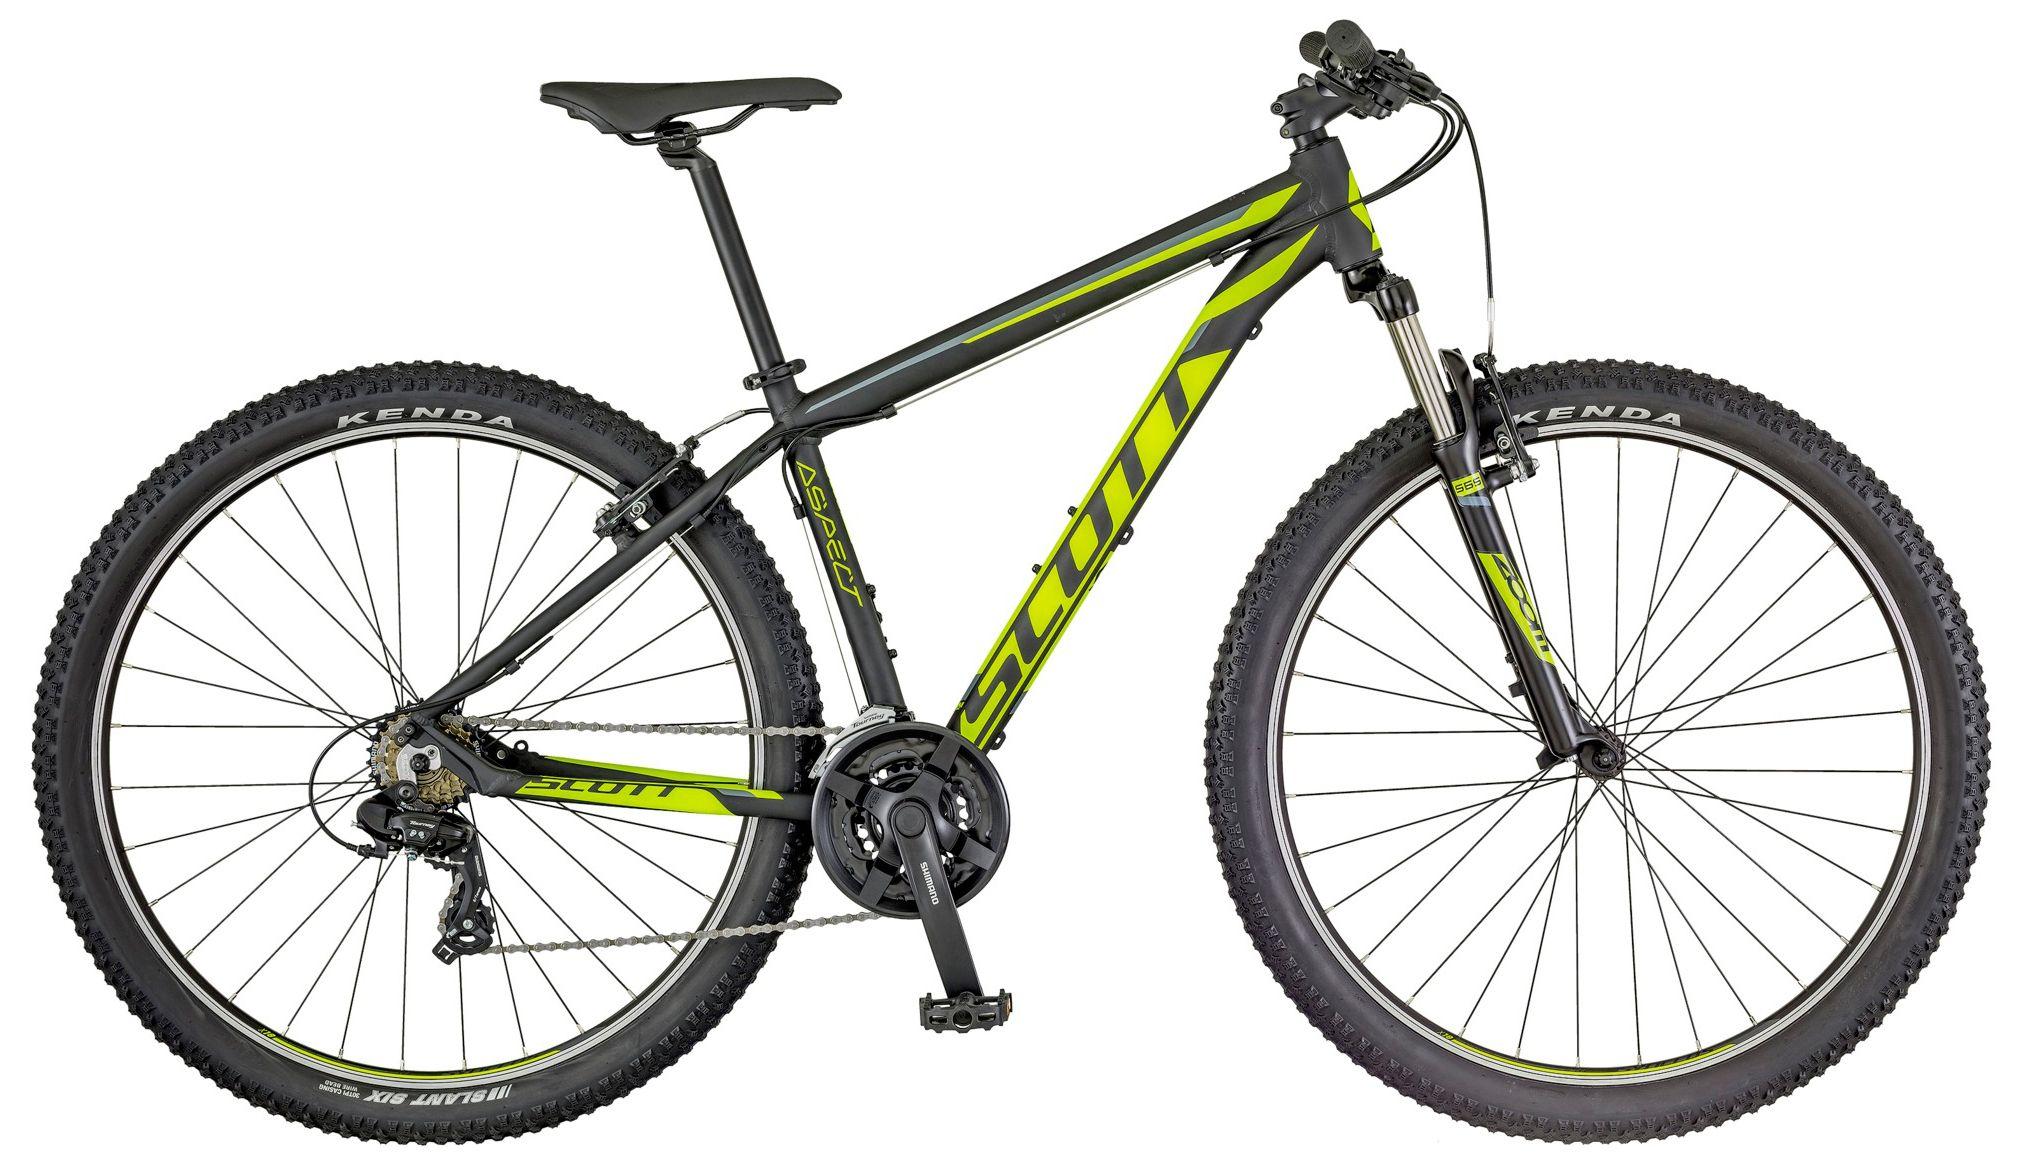 Велосипед Scott Aspect 780 2018 велосипед scott contessa solace 15 compact 2015